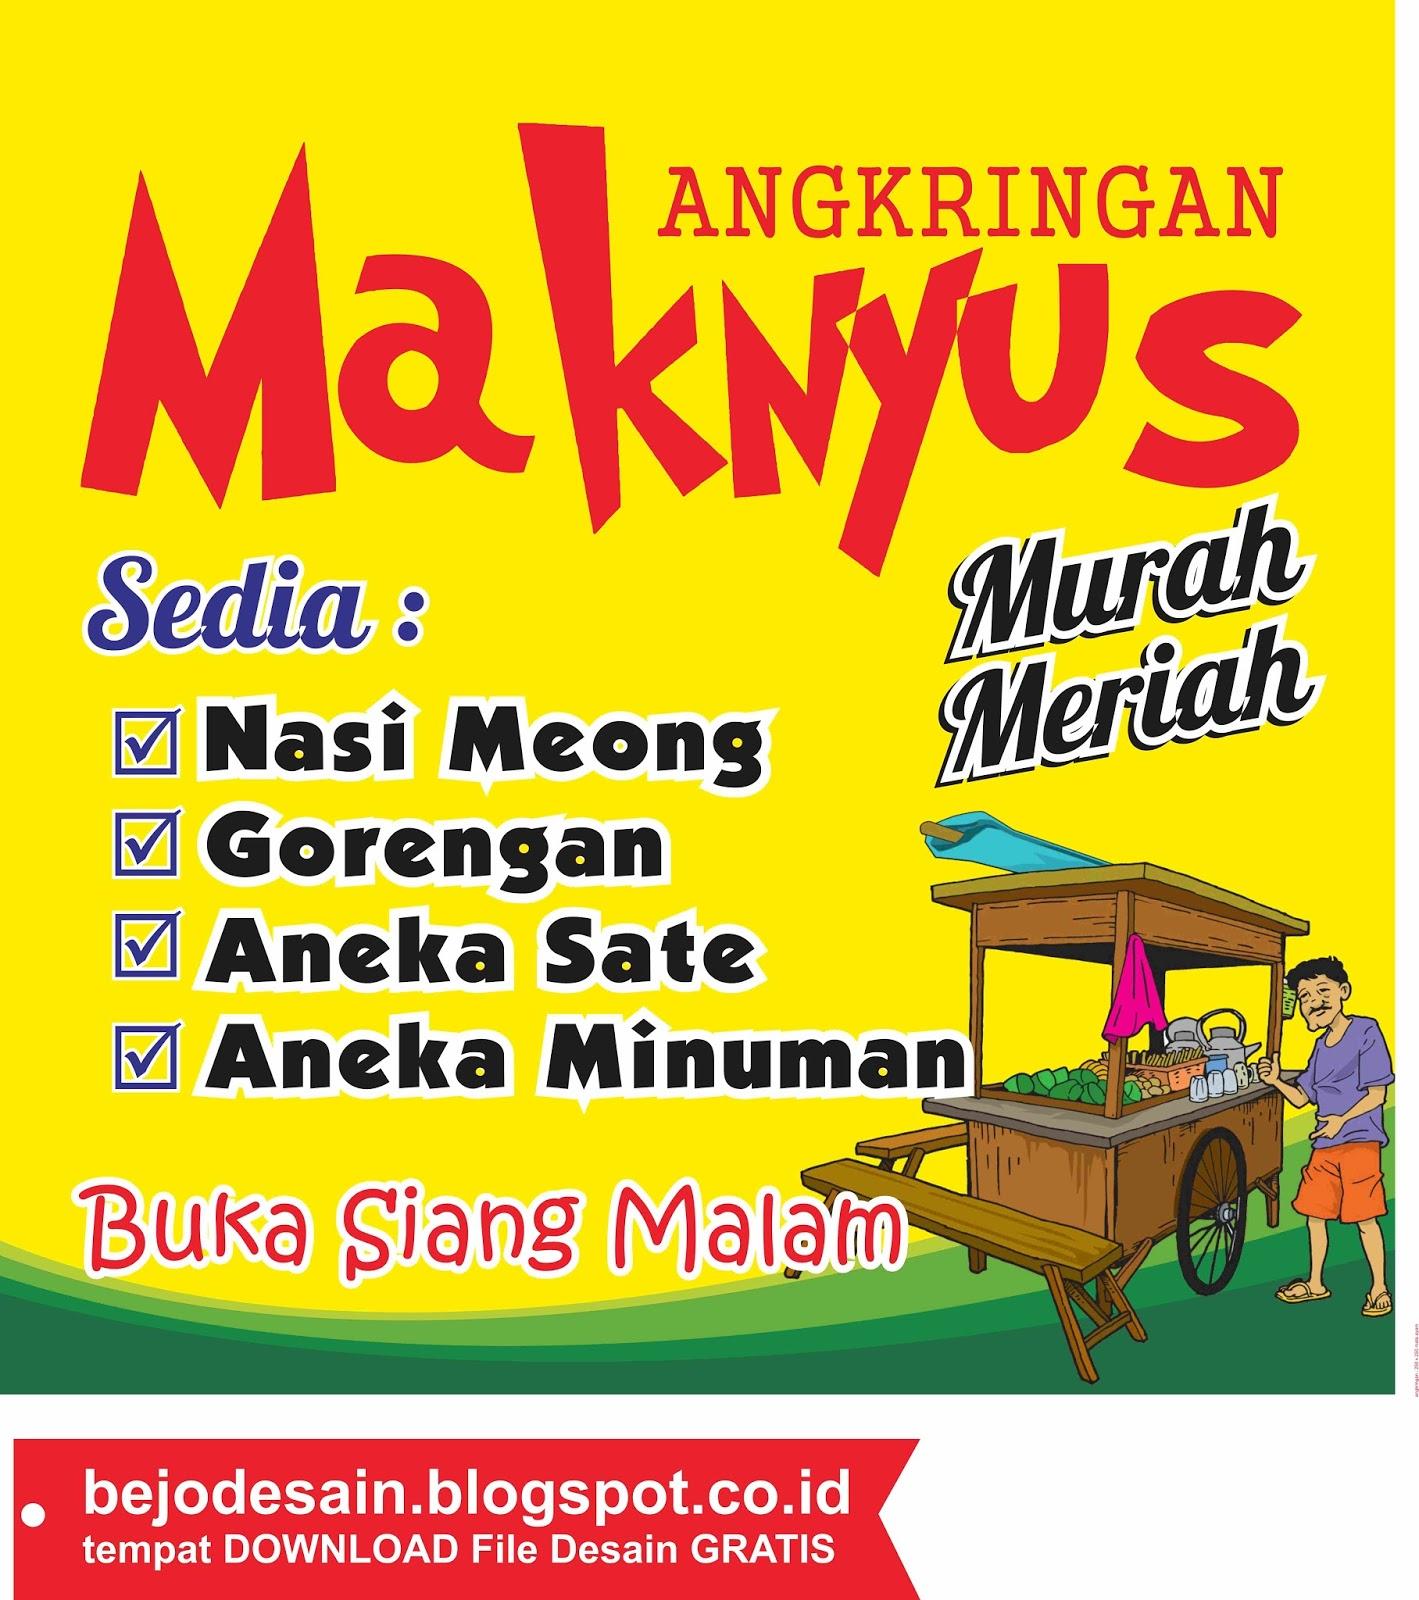 Banner Angkringan Keren - gambar spanduk